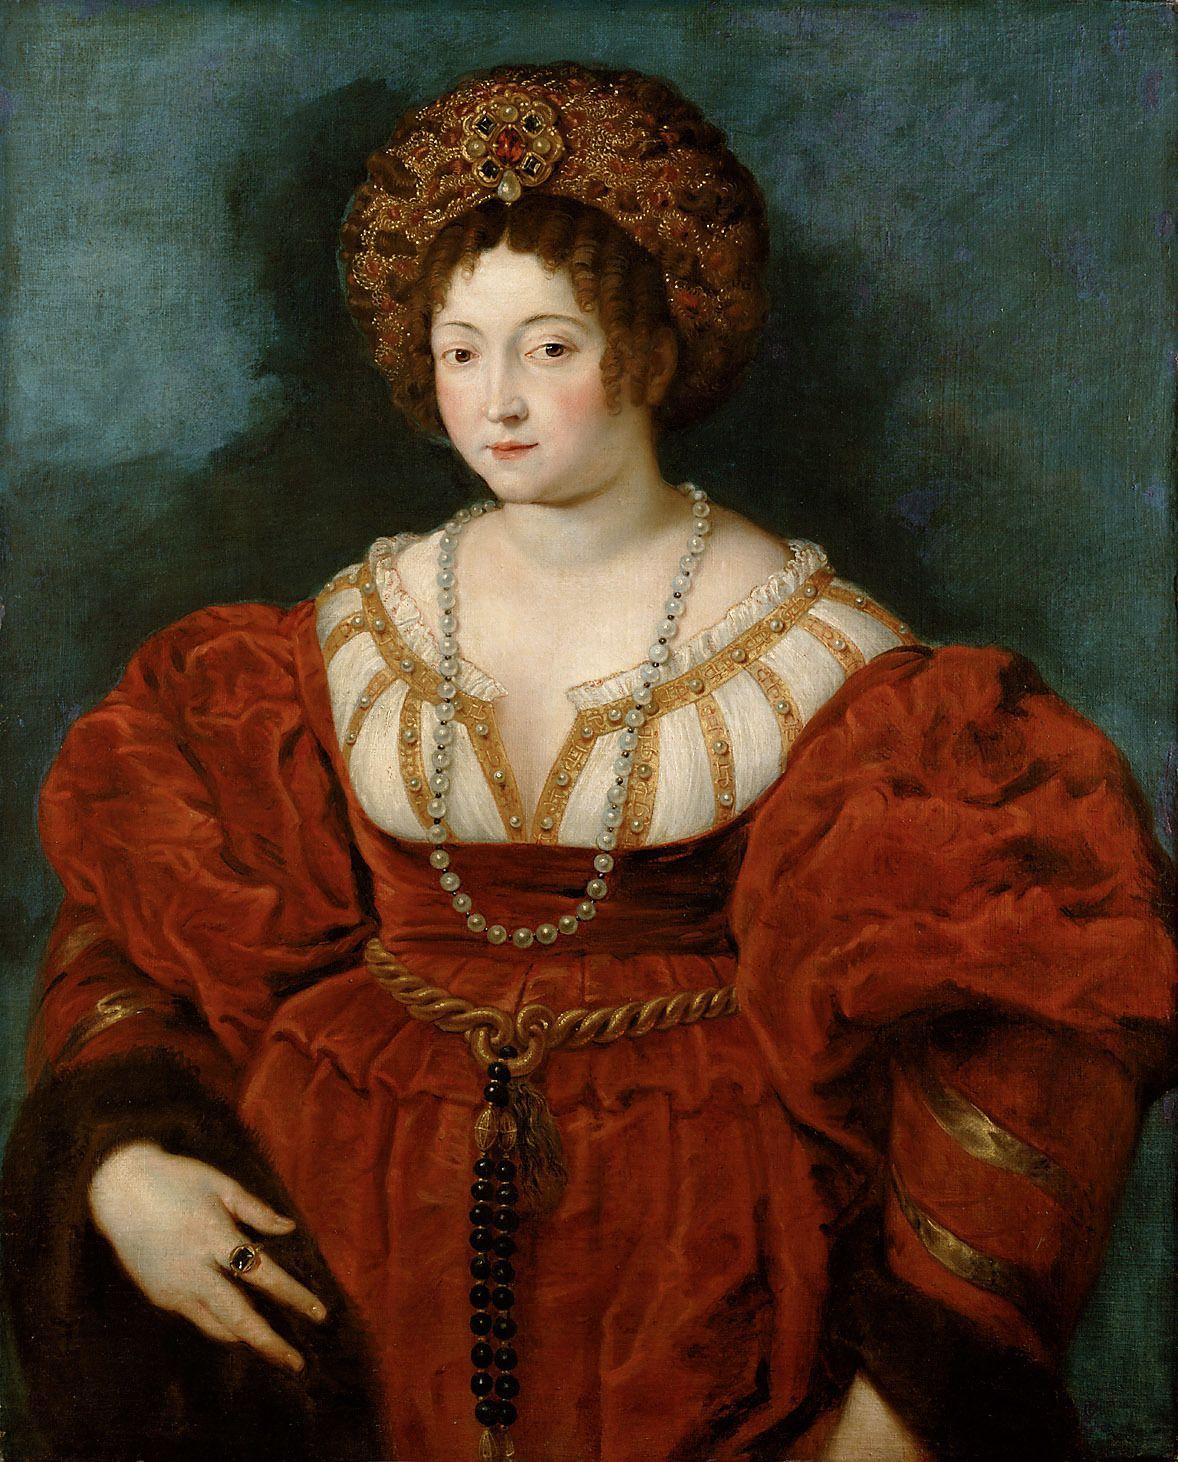 Rubens Frauen Bilder